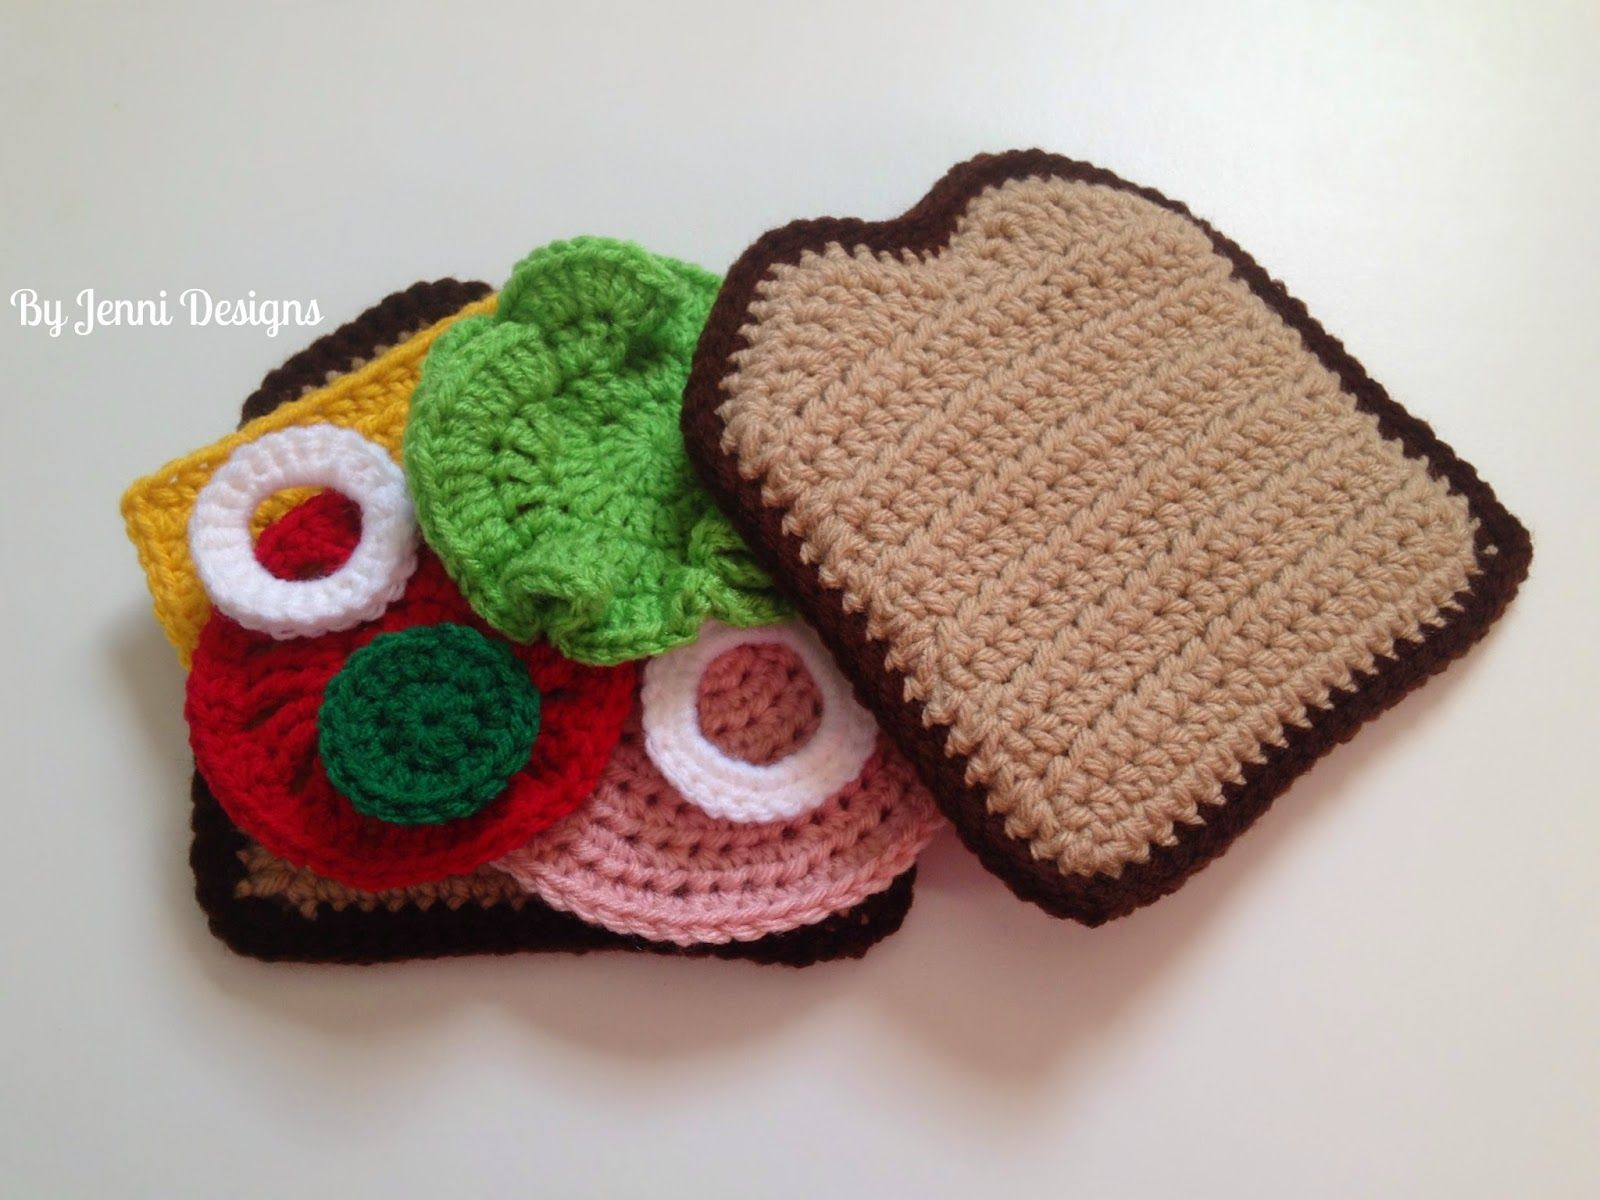 By jenni designs crochet amigurumi bologna sandwich play set by jenni designs crochet amigurumi bologna sandwich play set free crochet pattern bankloansurffo Choice Image